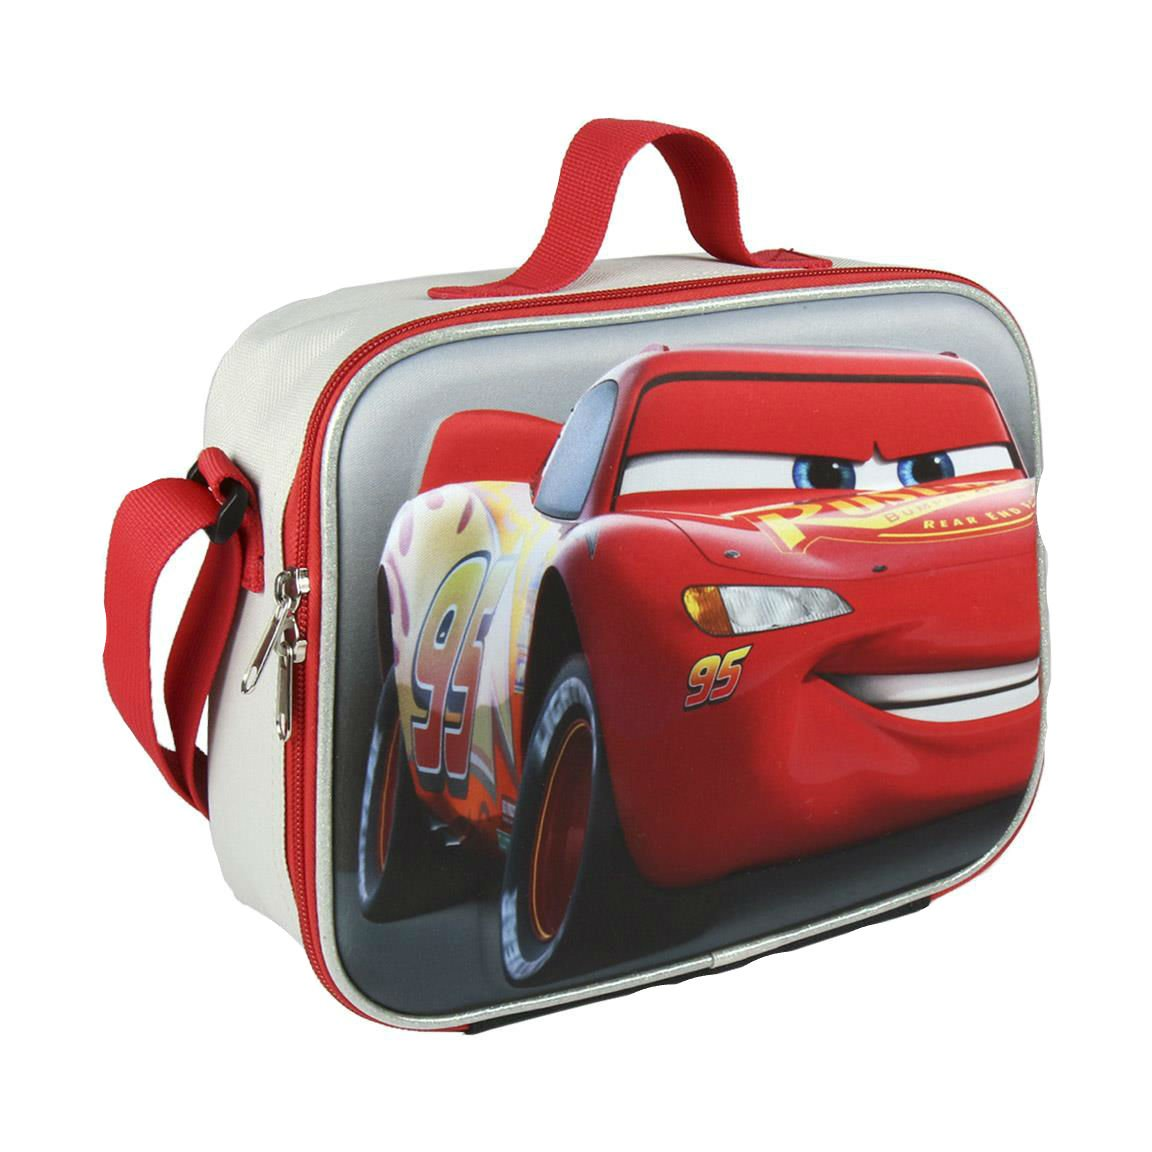 Cerd/á 3D Cars Bolso de Viaje 23 cm Gris